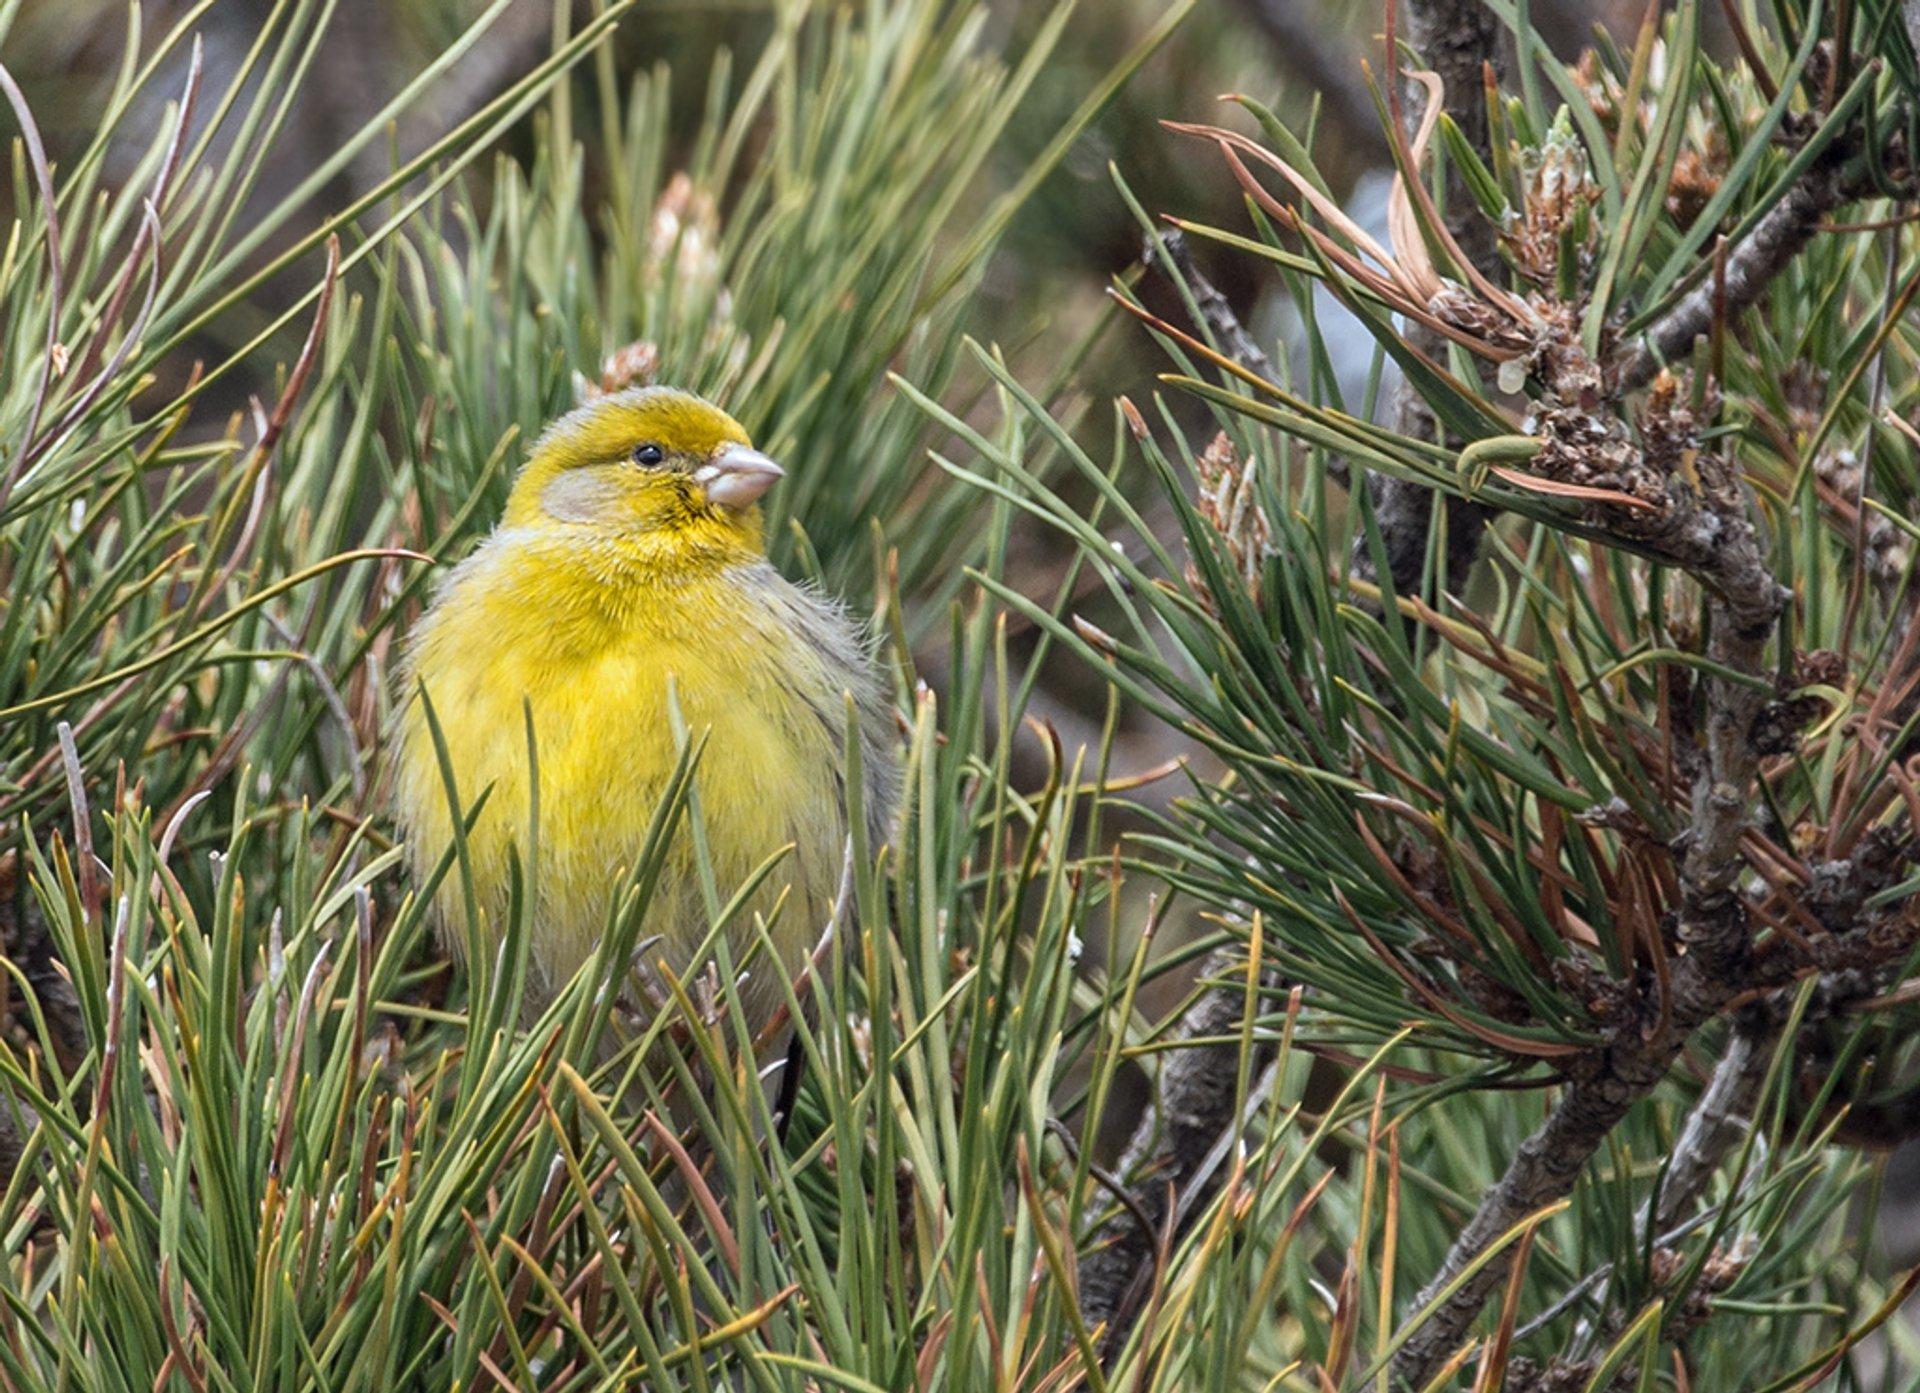 Atlantic Canary Breeding in Canary Islands - Best Season 2019